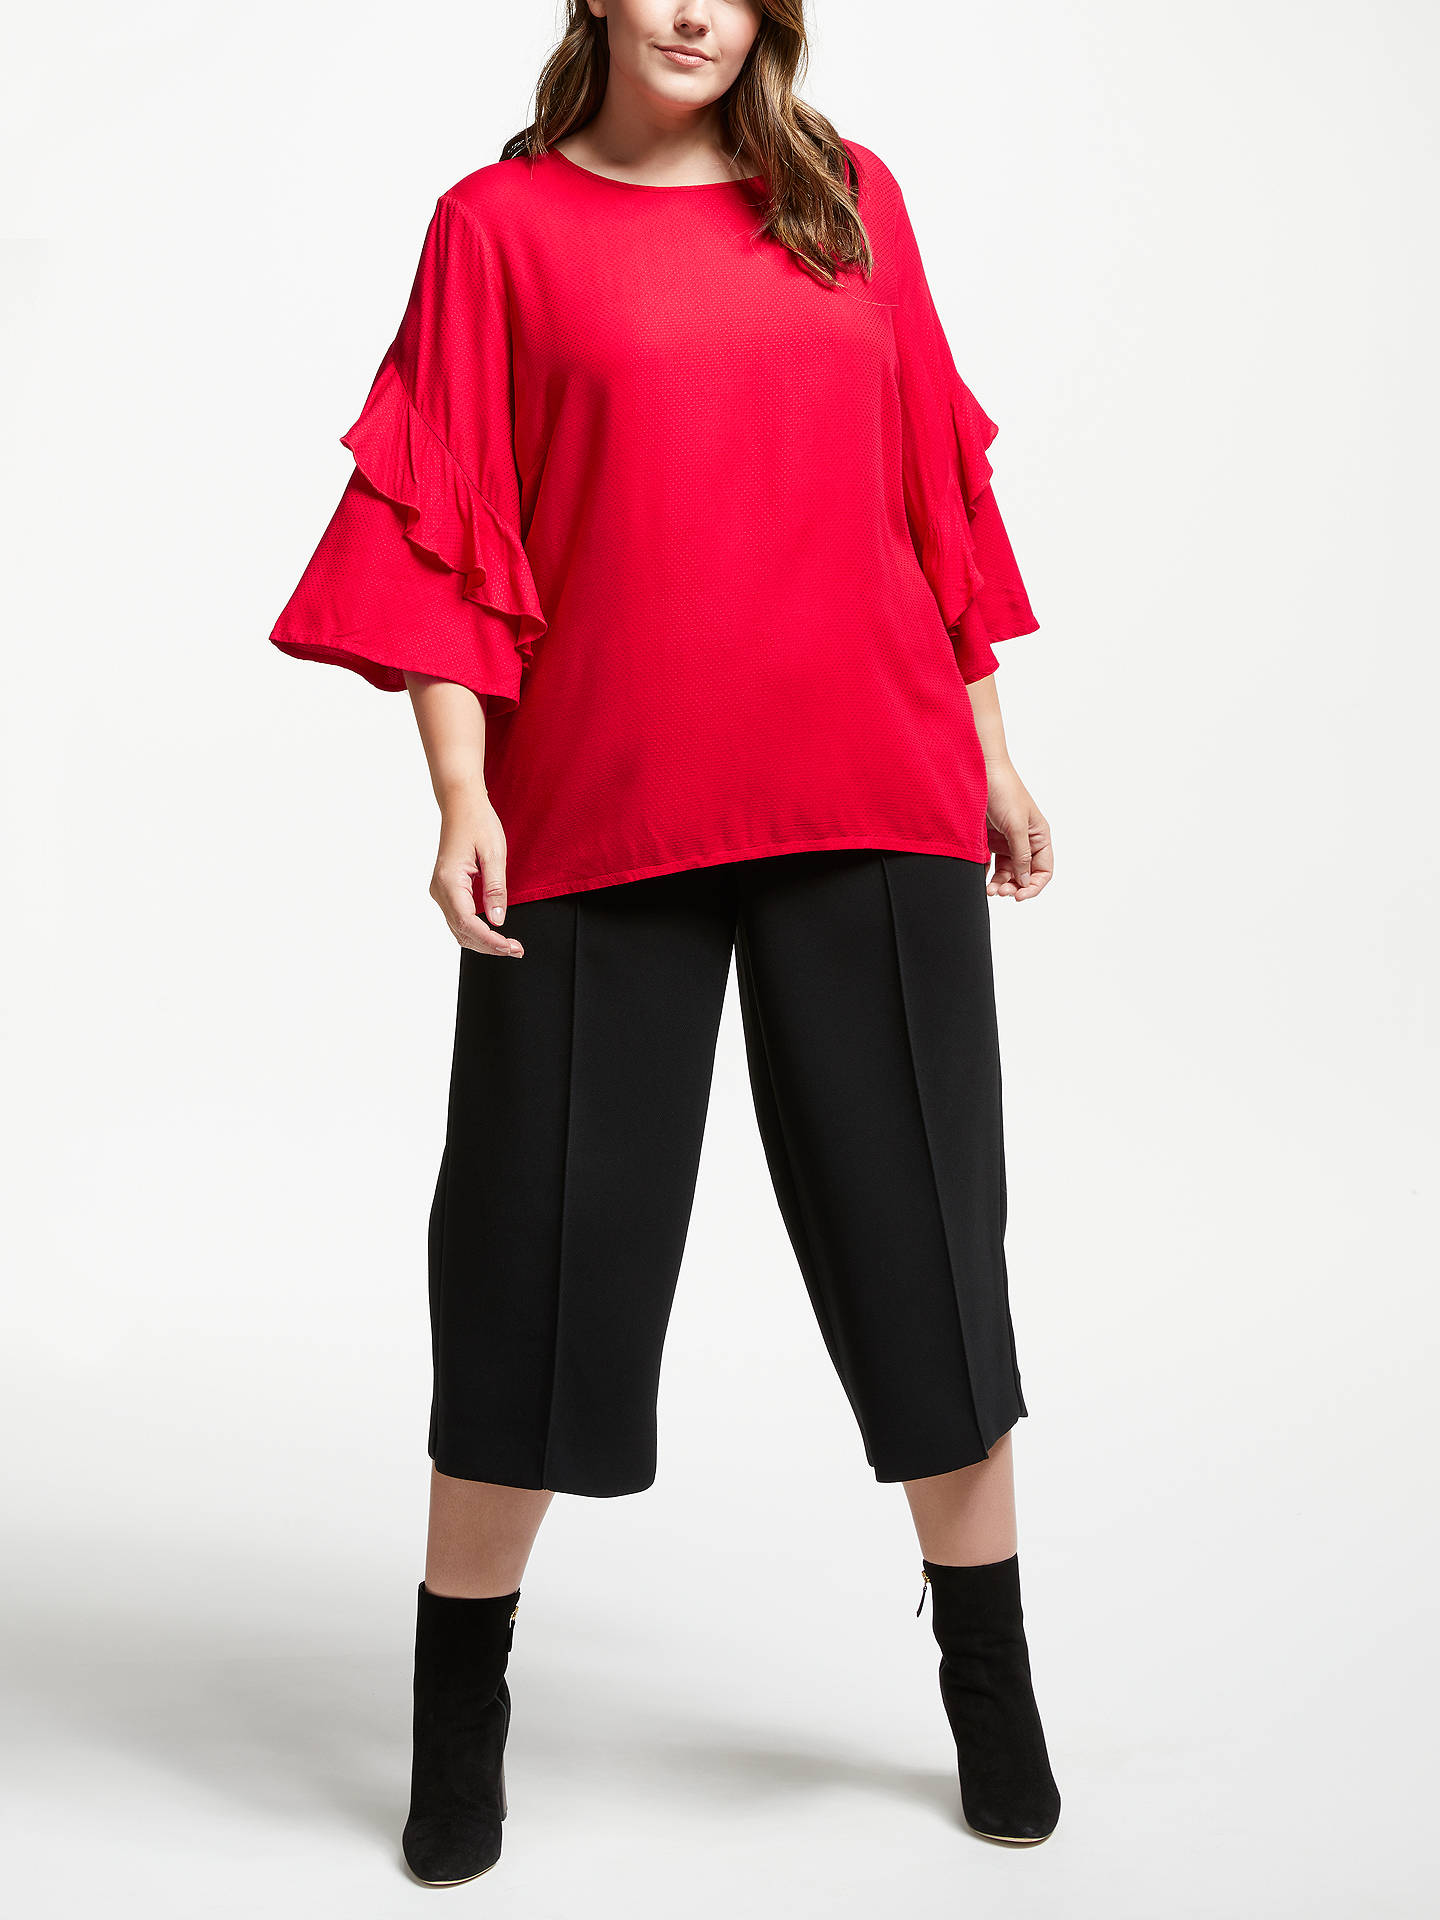 Junarose Womens Plus Size Lona Three Quarter Sleeve Blouse